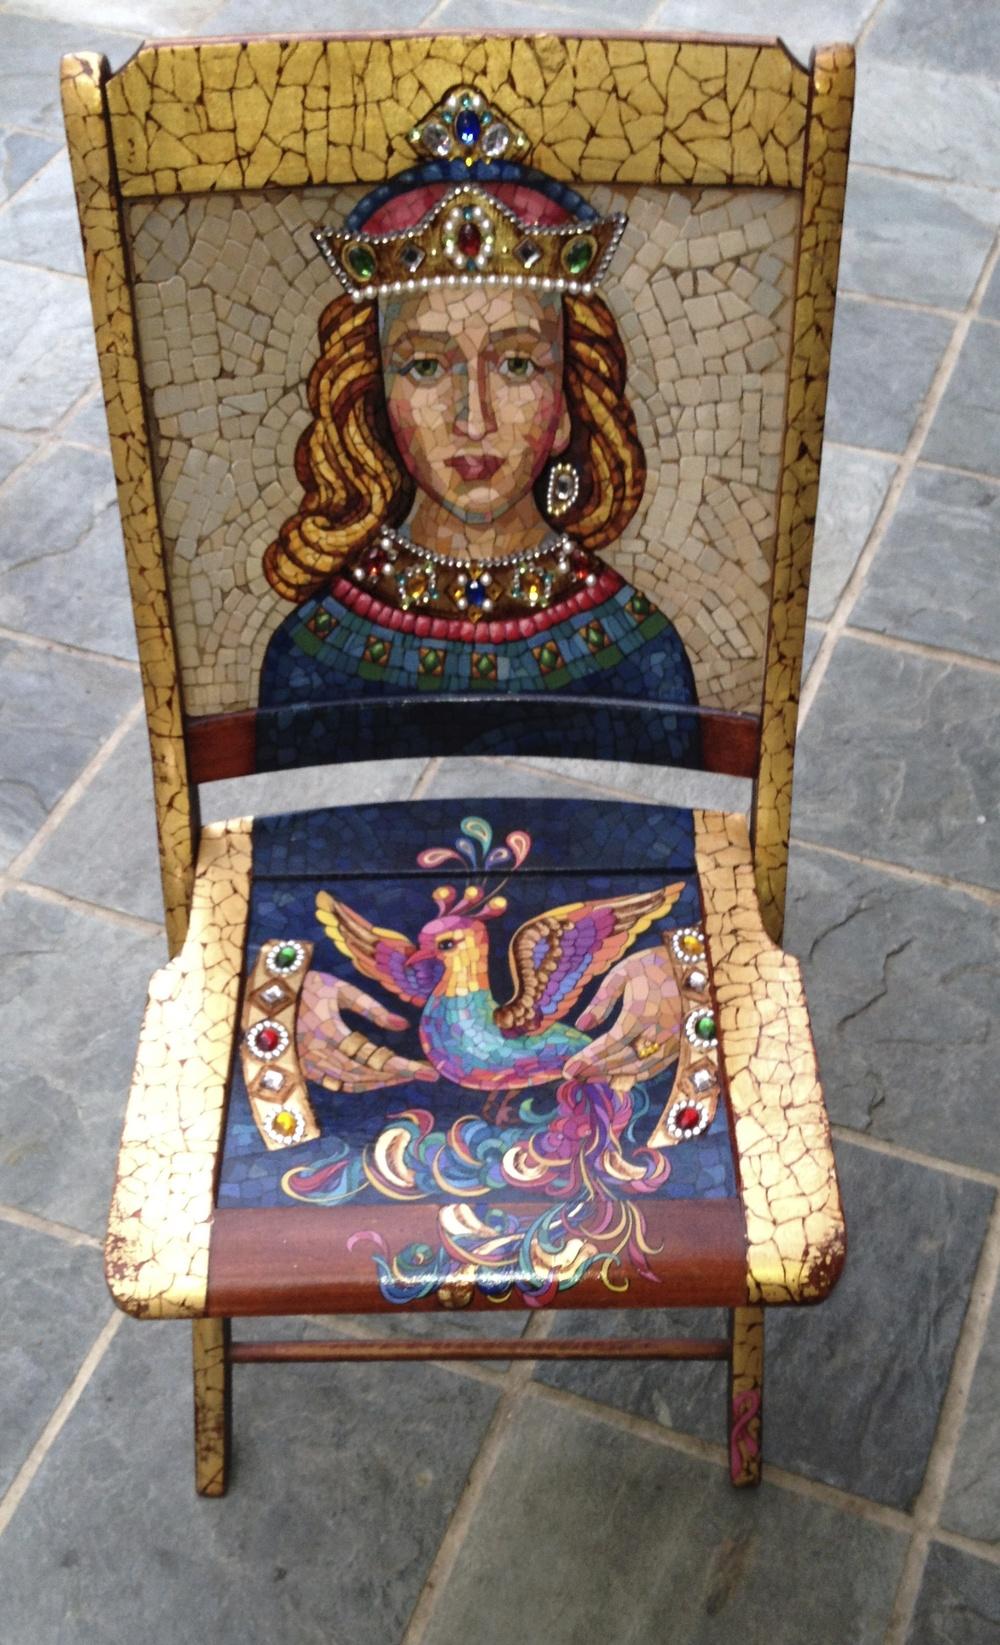 Chair # 28 Tanya Larin